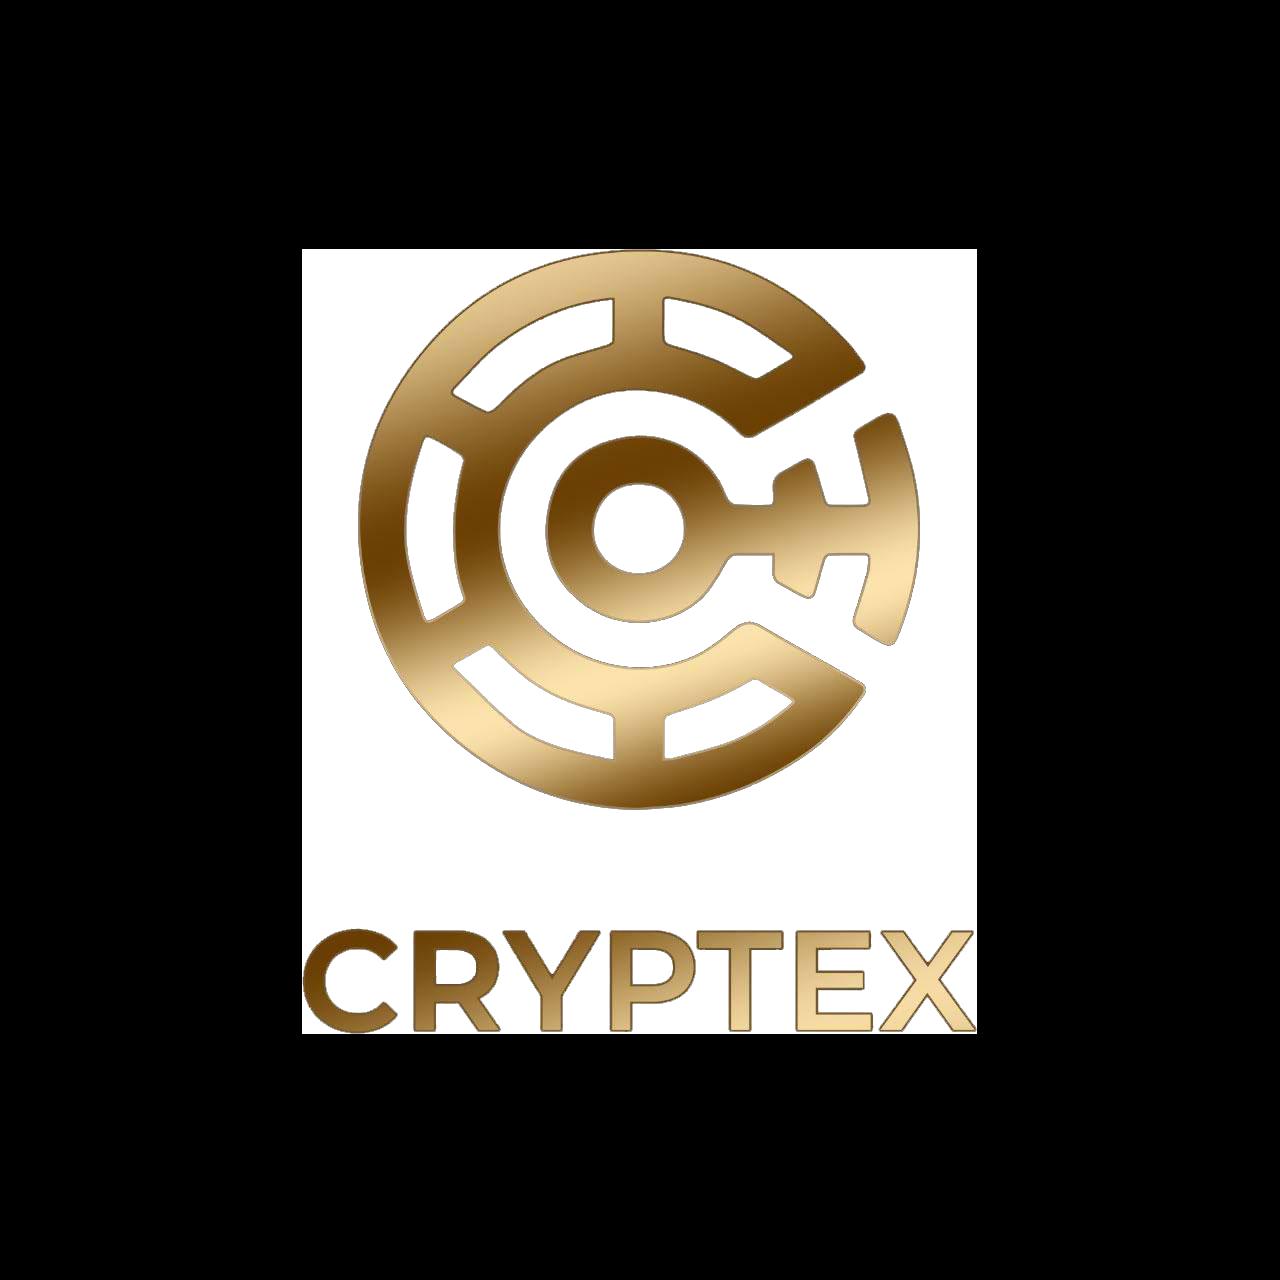 Cryptex logo